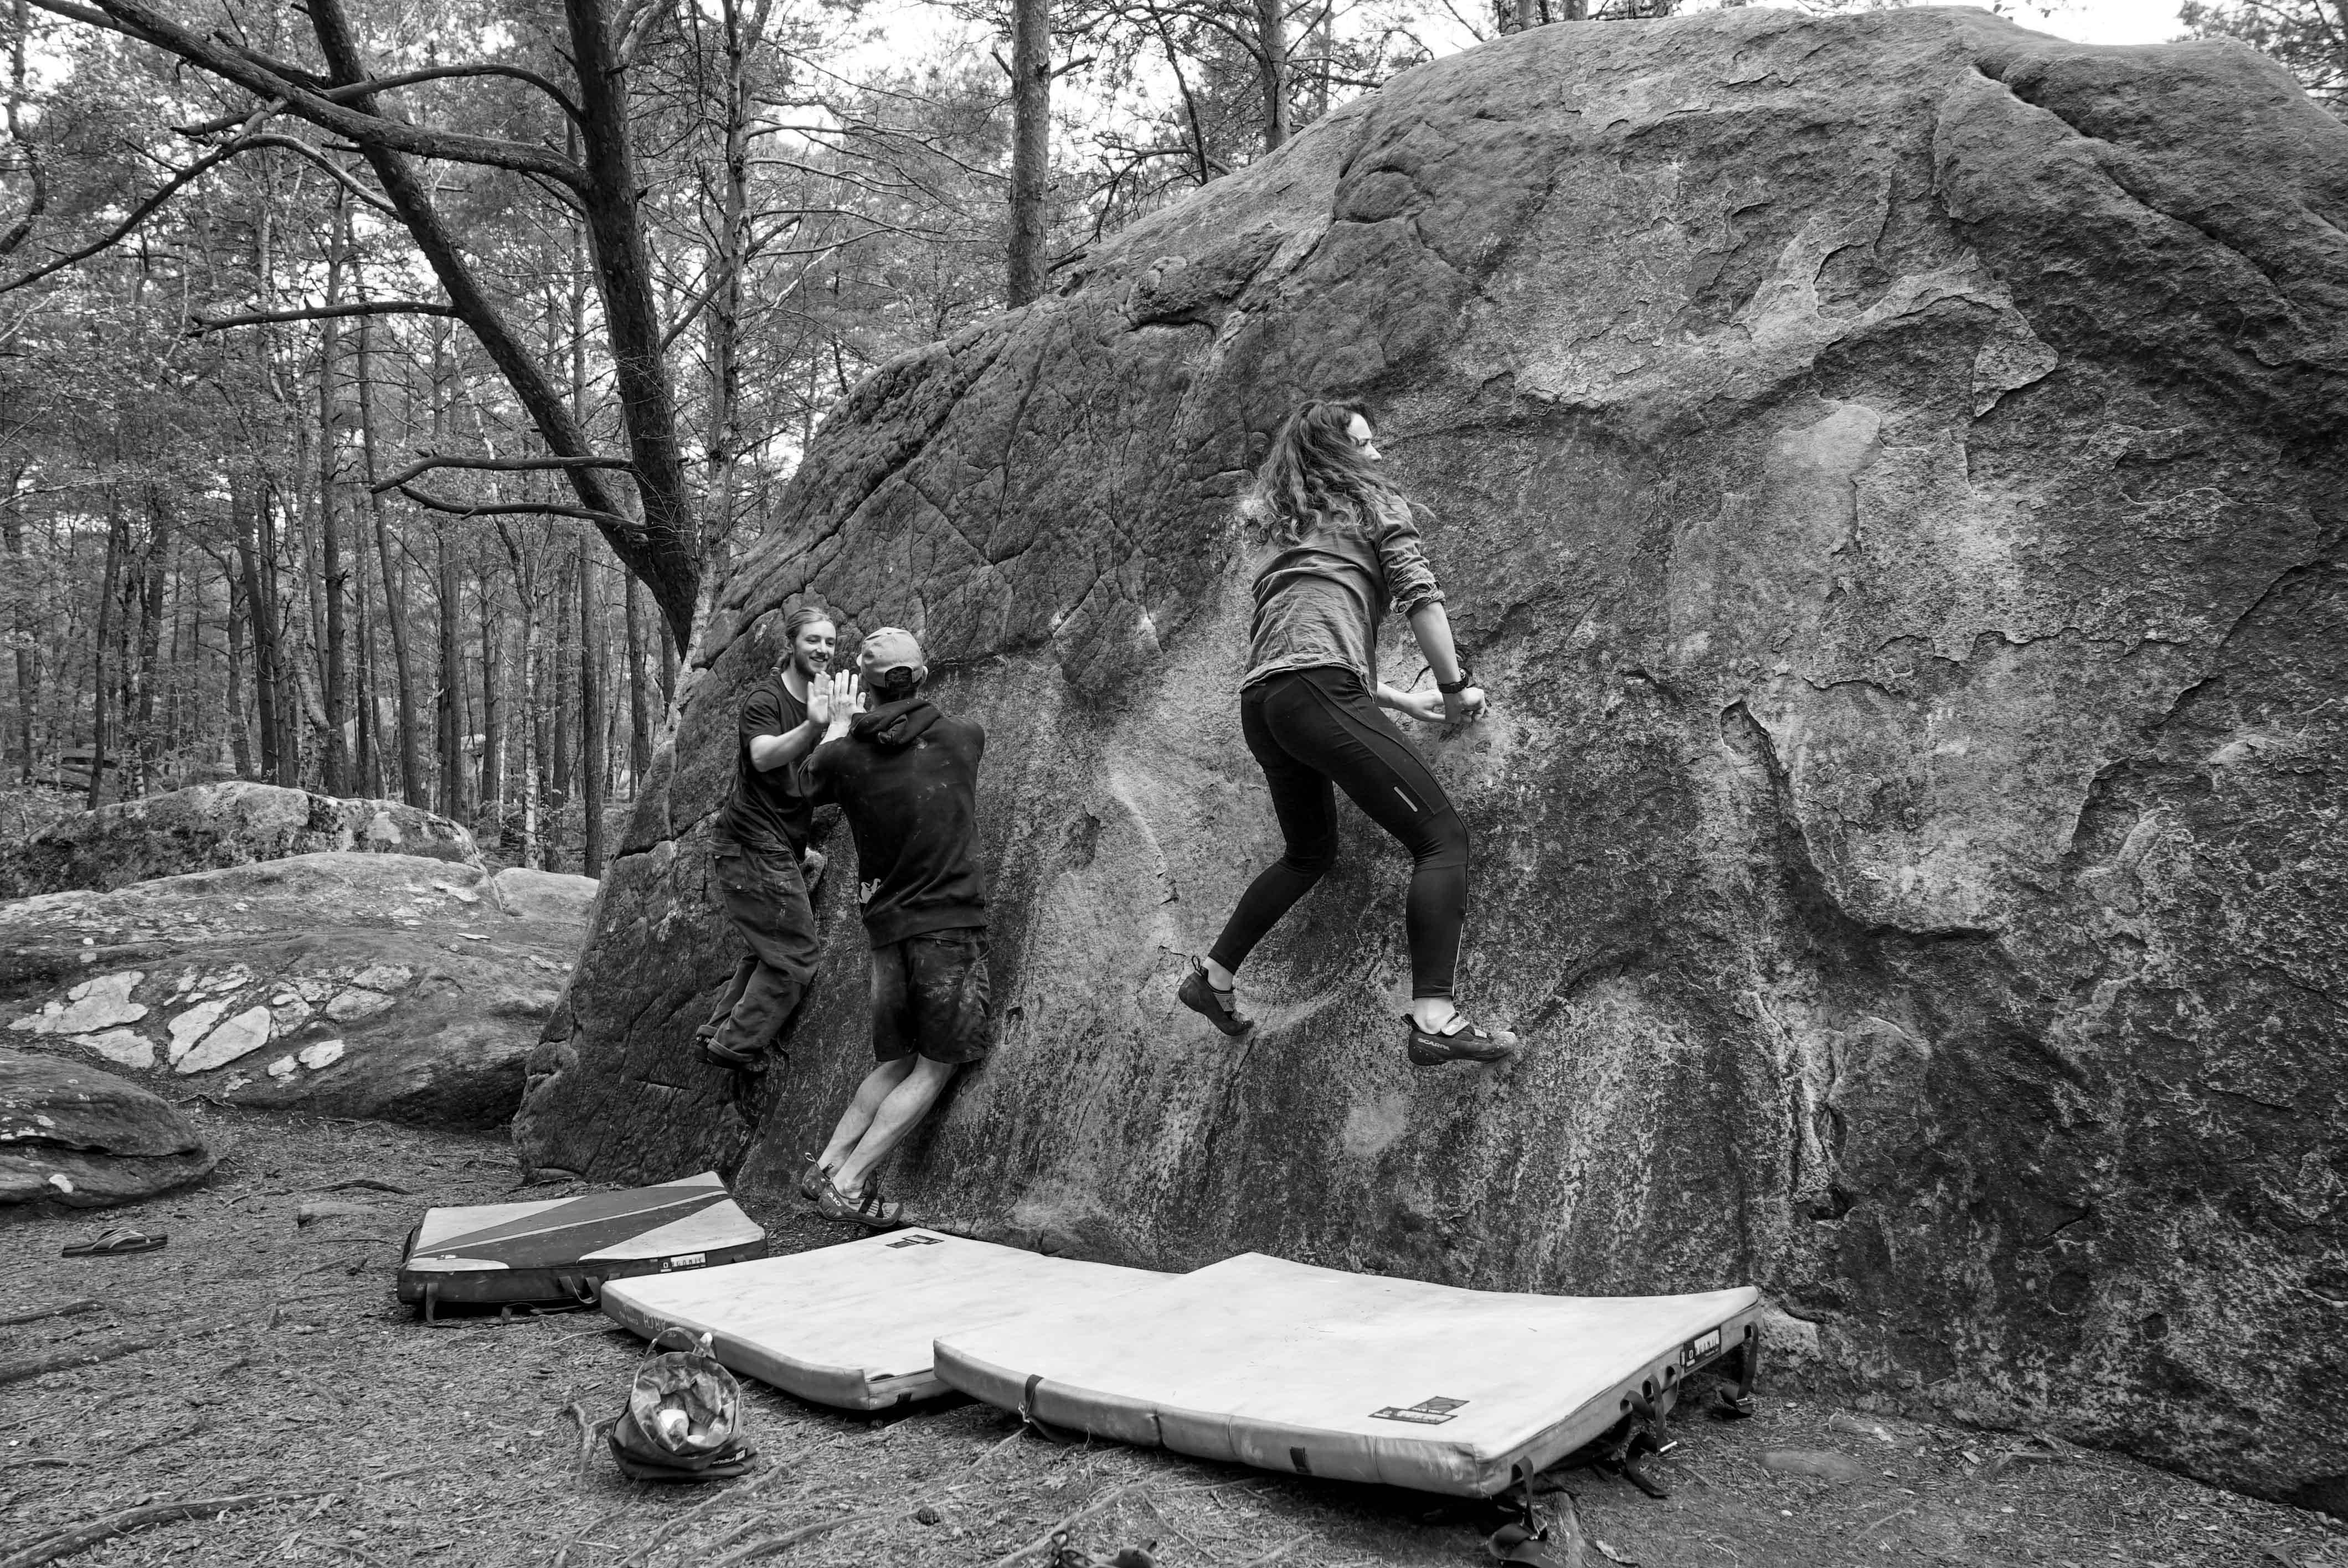 fontainbleau climbing 2016 mike brindley-61